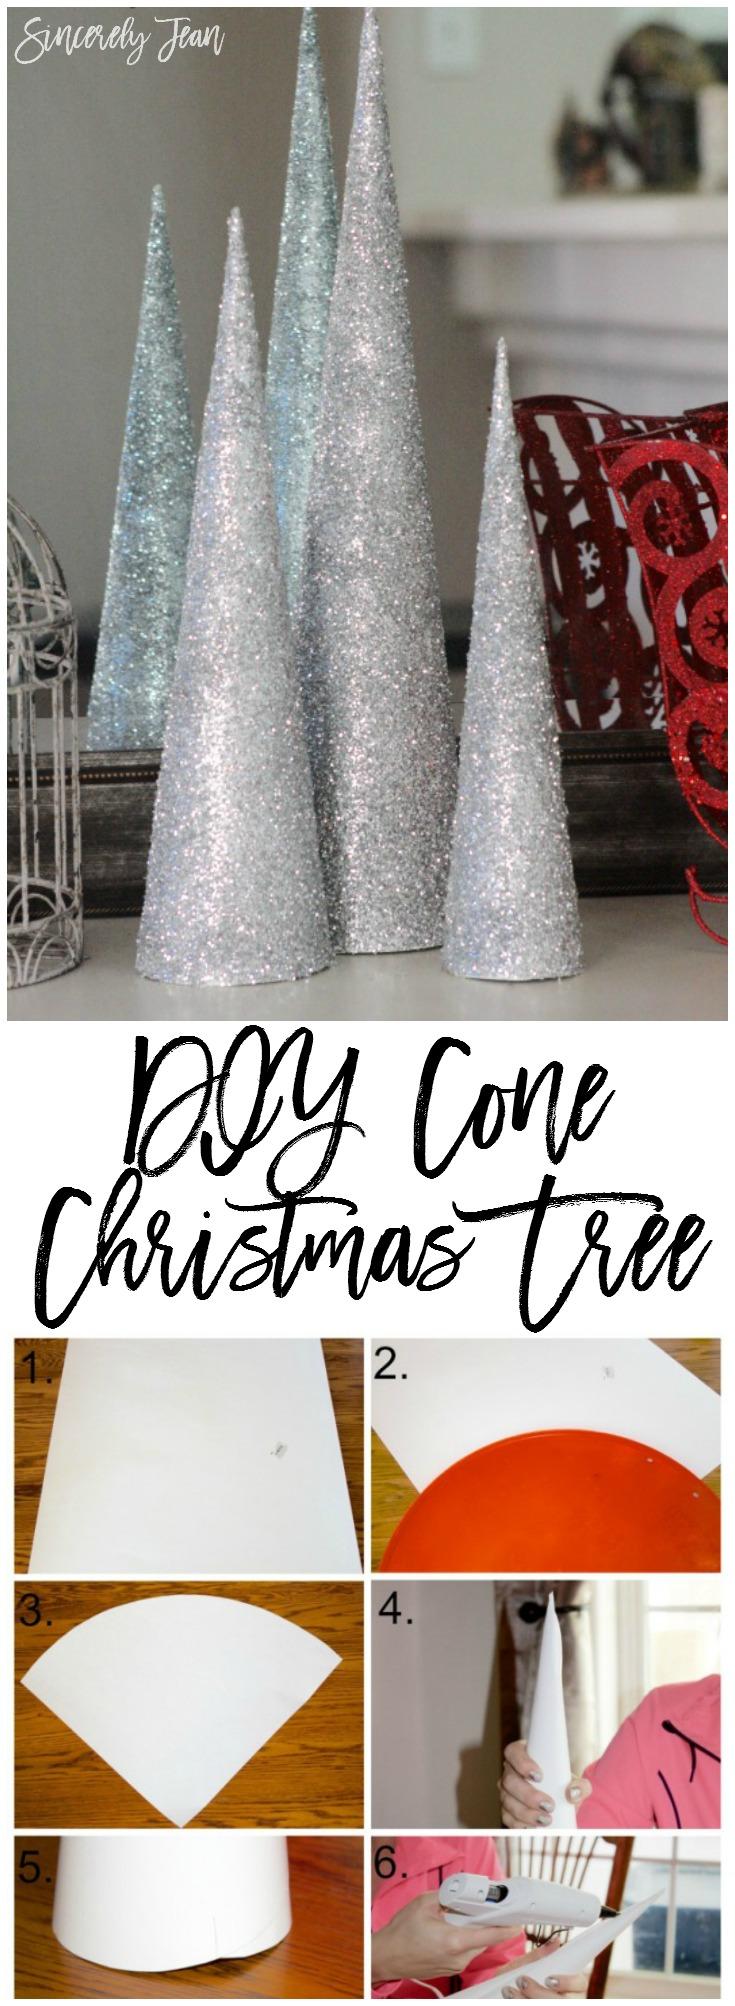 DIY Cone Christmas Tree Step by